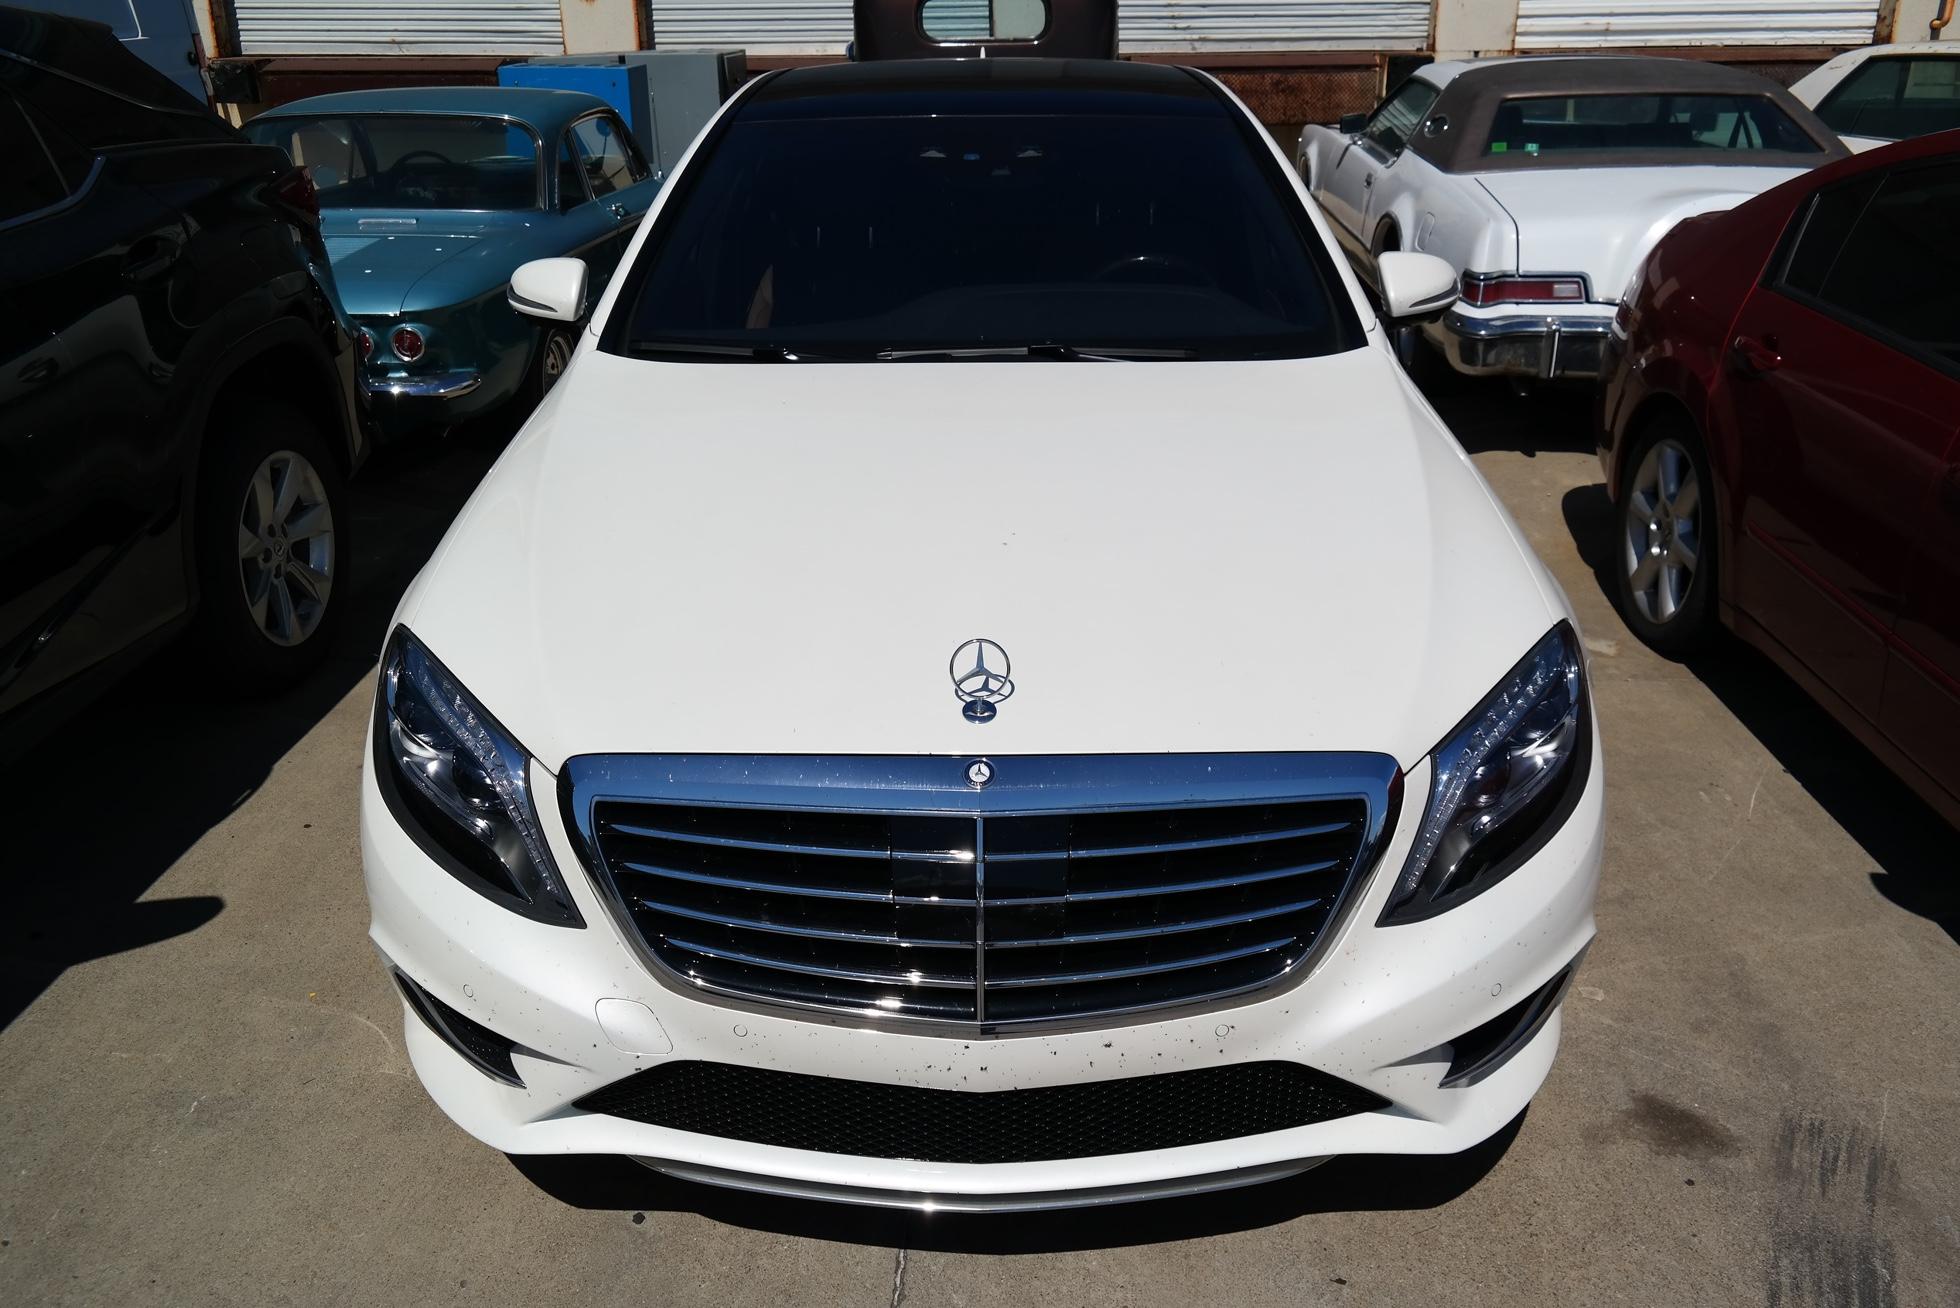 Mercedes S-Class Shipping Overseas